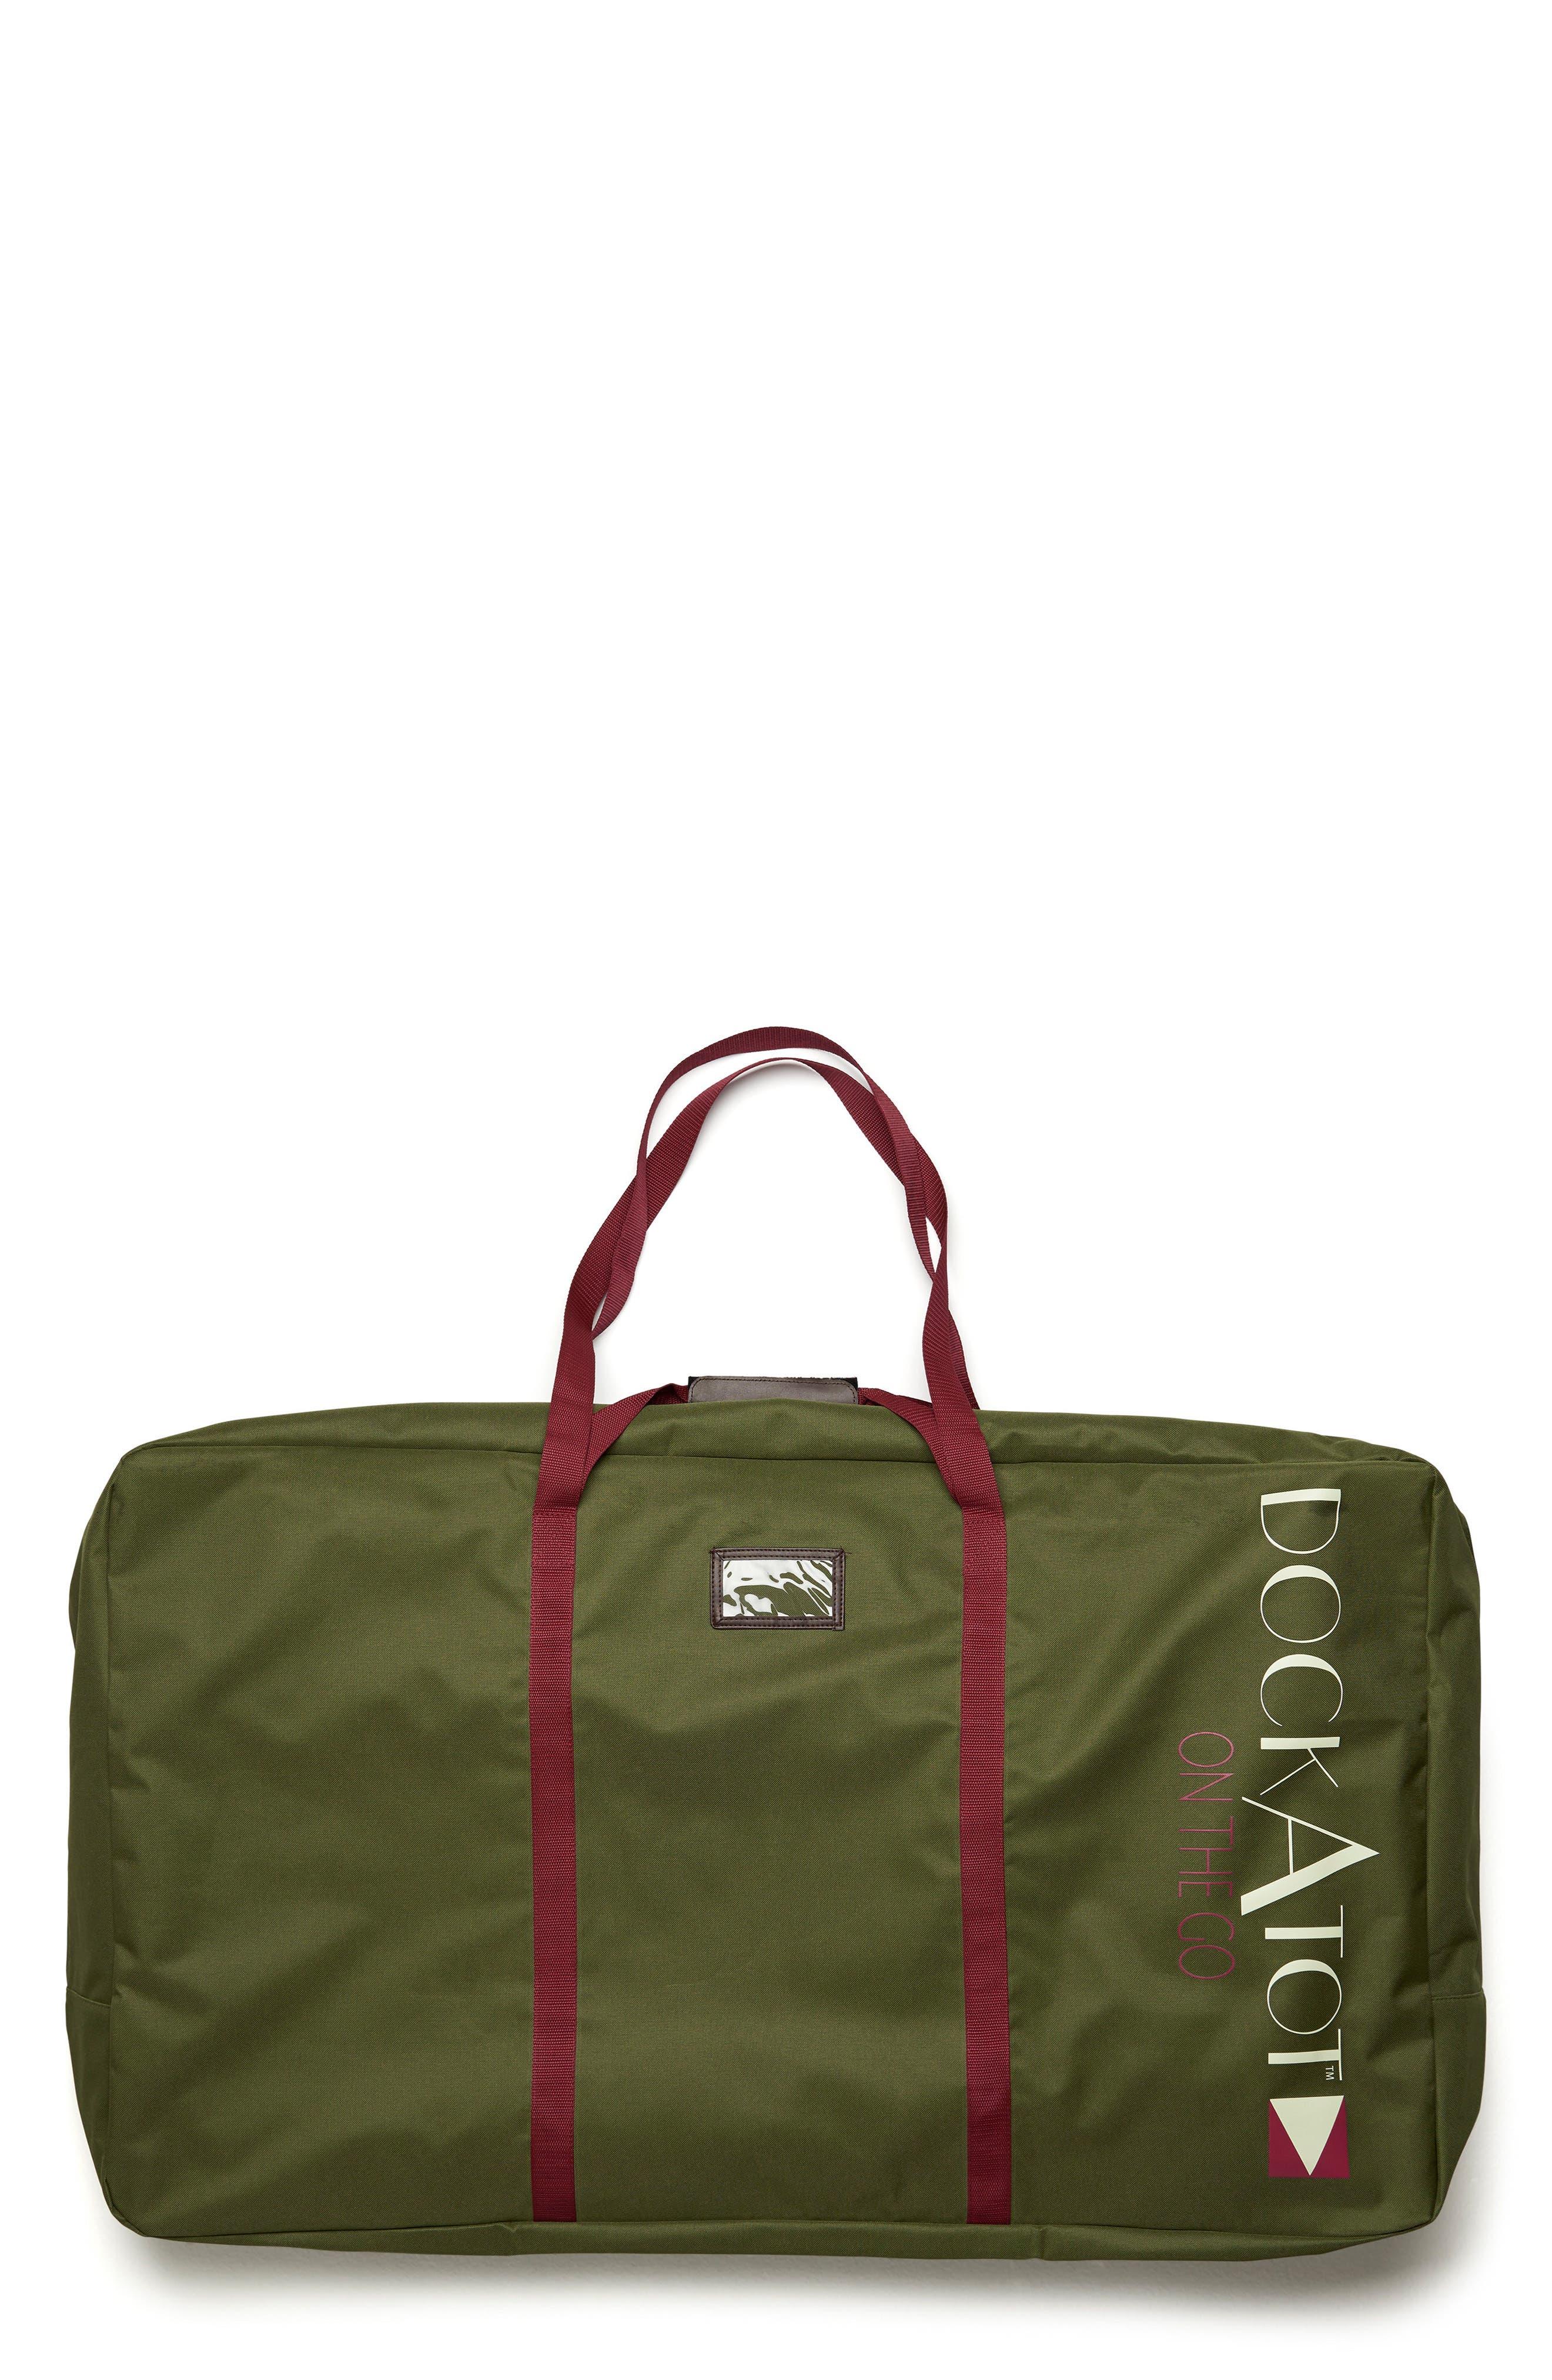 Grand Transport Bag,                         Main,                         color, MOSS GREEN